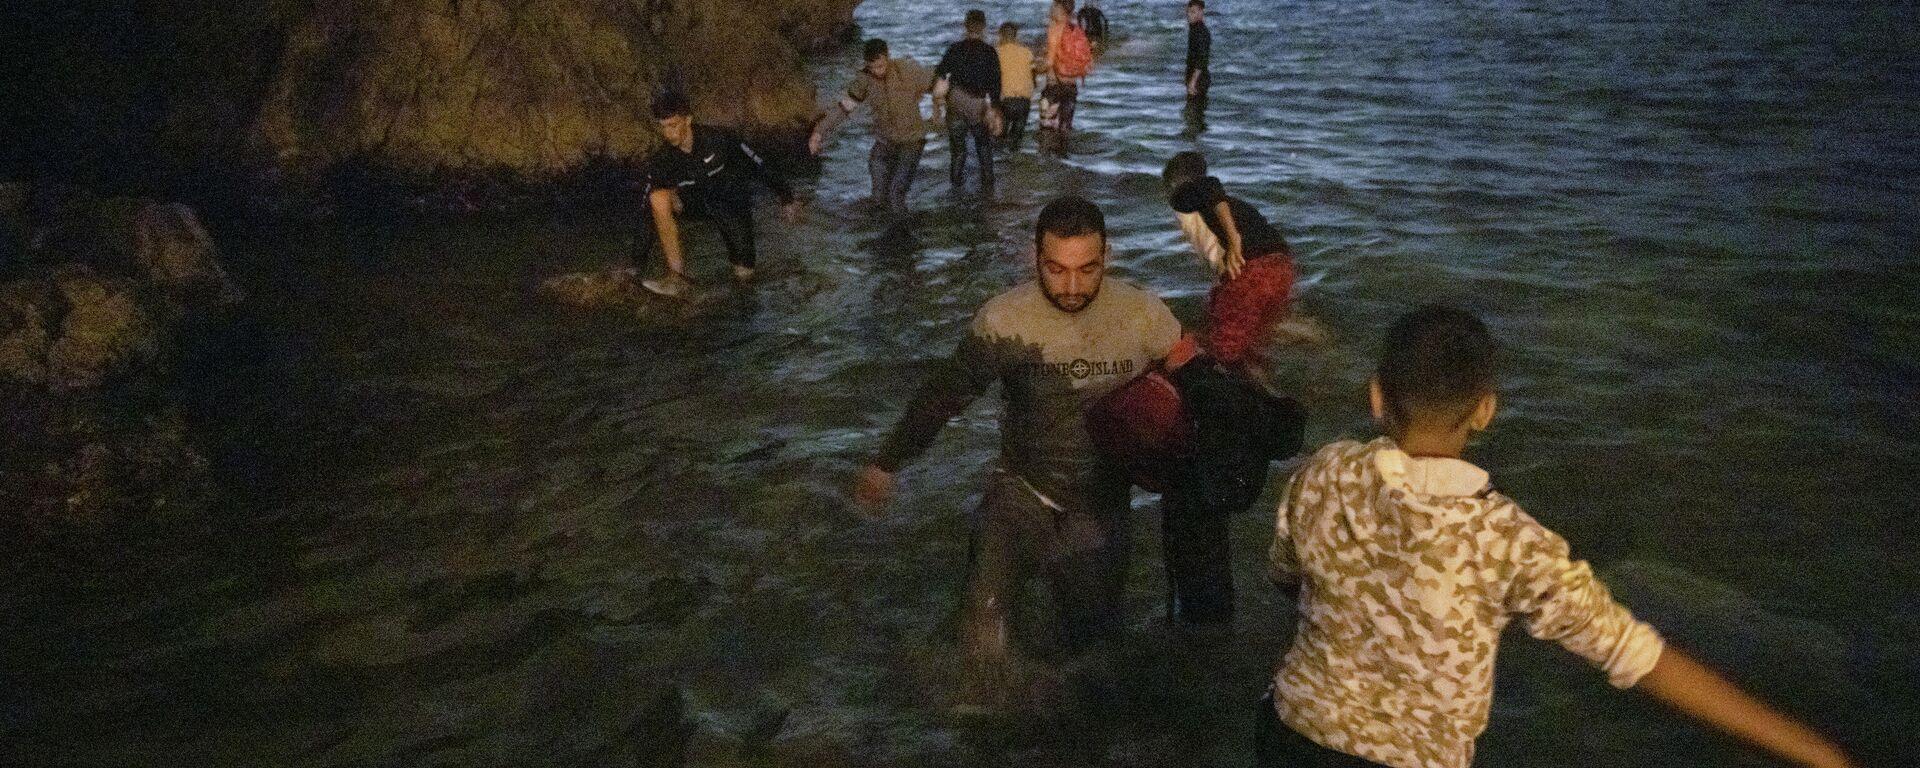 Refugiados marroqíes llegan a Ceuta - Sputnik Mundo, 1920, 18.05.2021